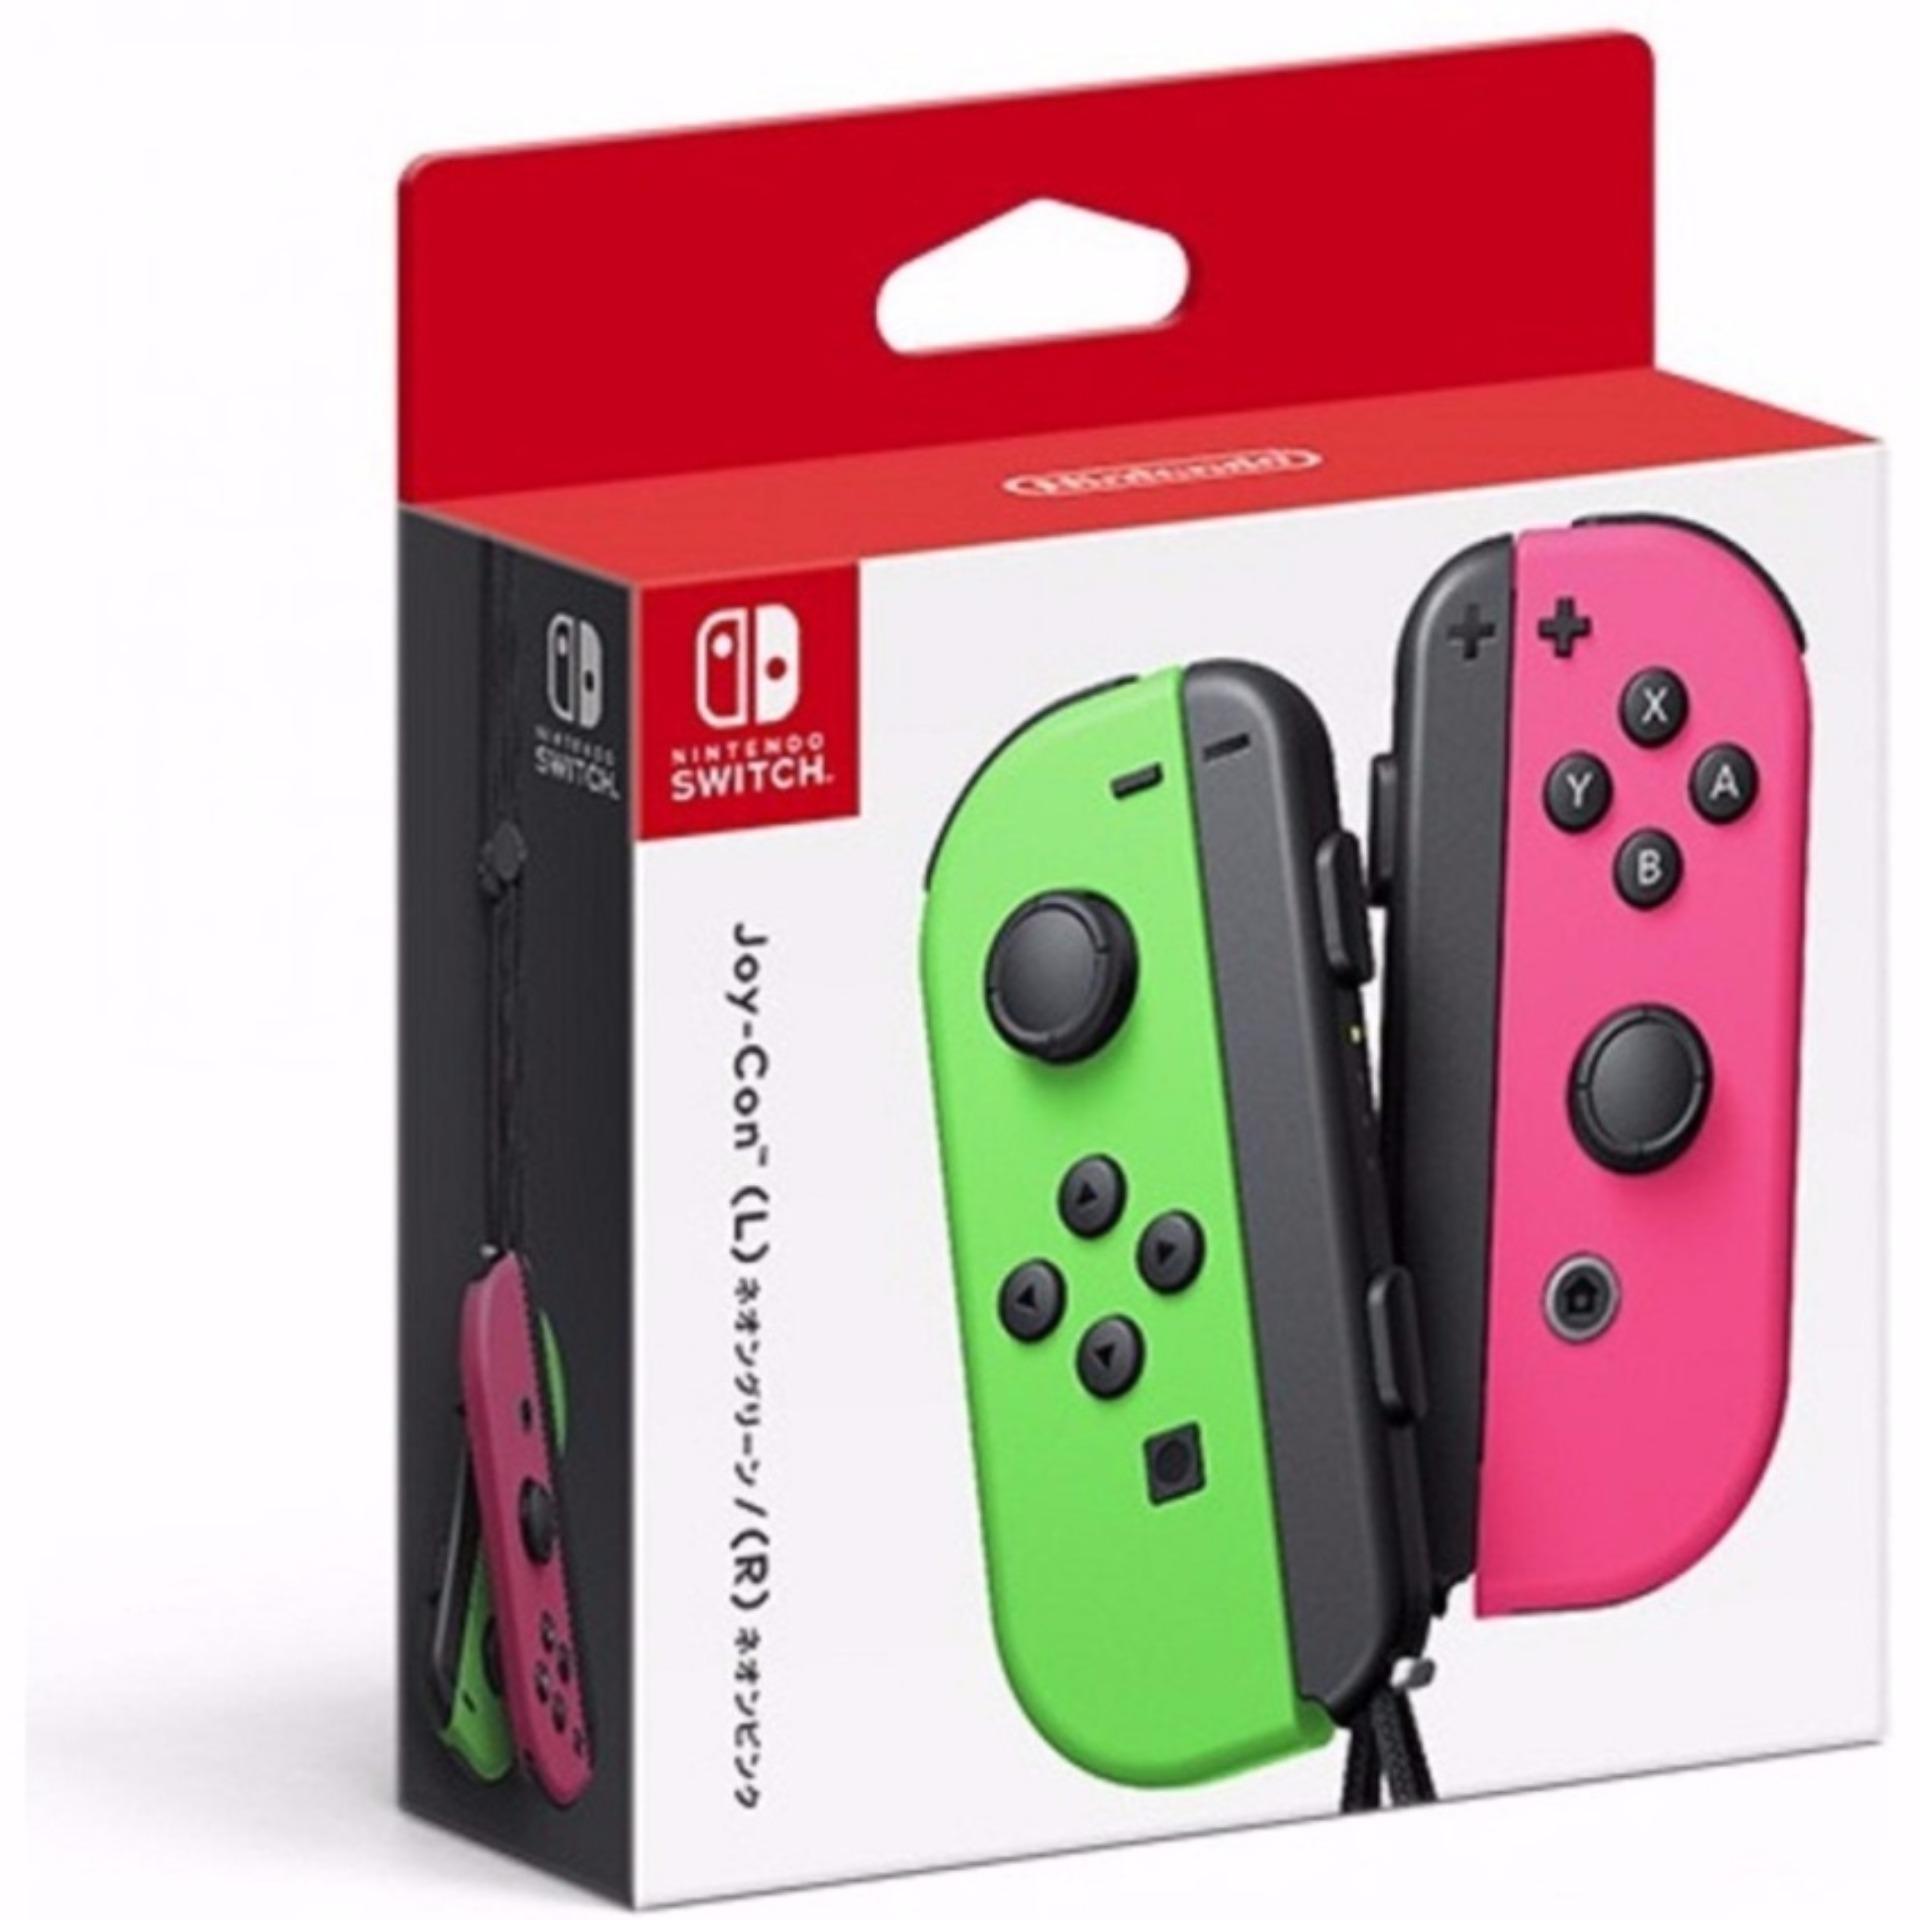 [3 Months Local Warranty] Nintendo Switch Joy-con Neon Green Neon Pink Controller